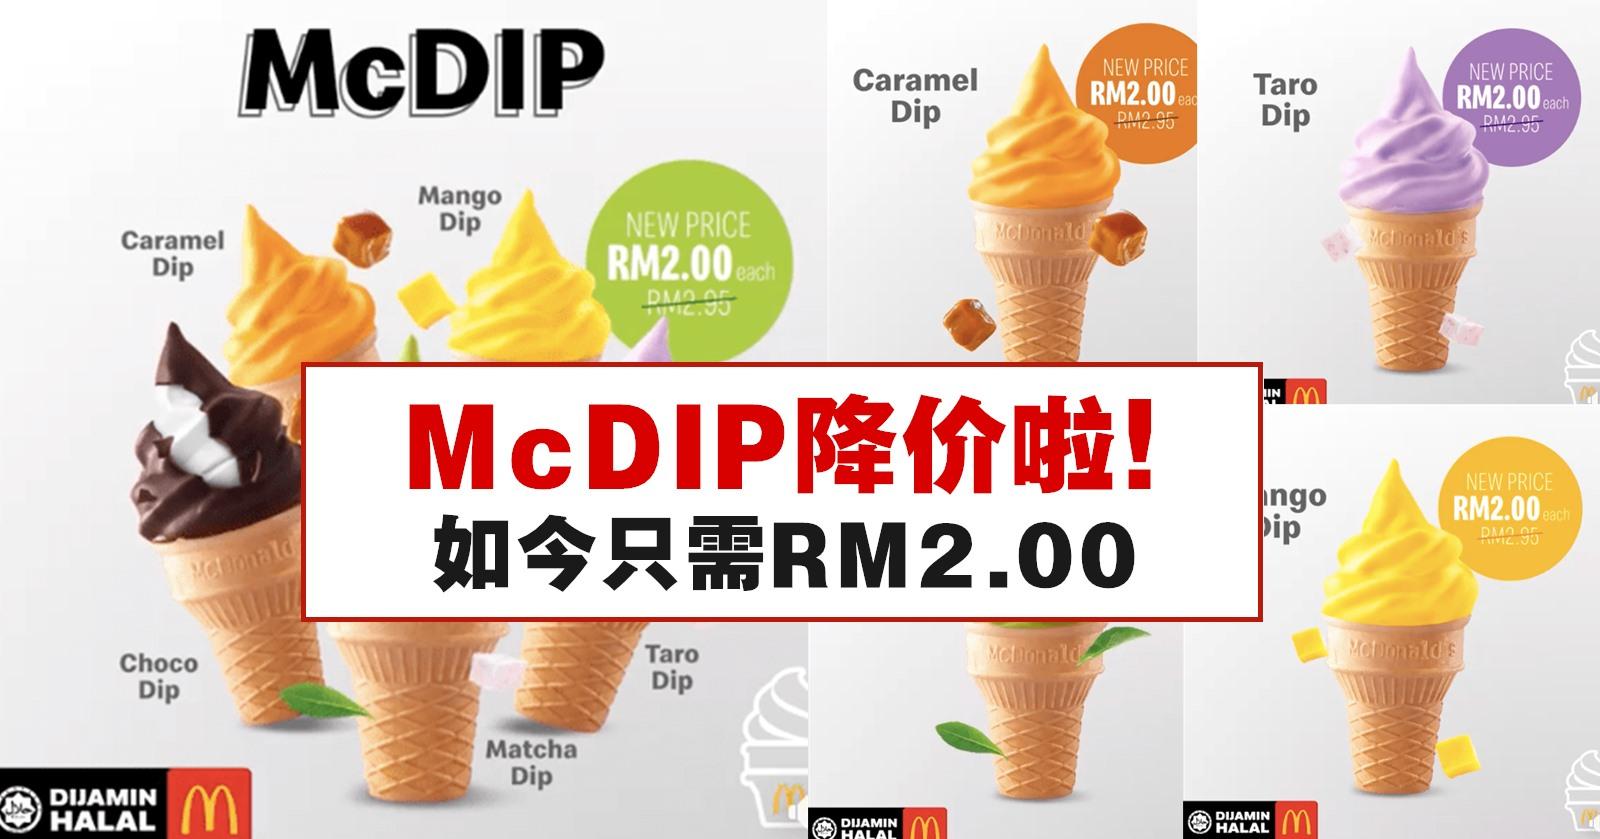 McDIP降价啦!如今只需RM2.00